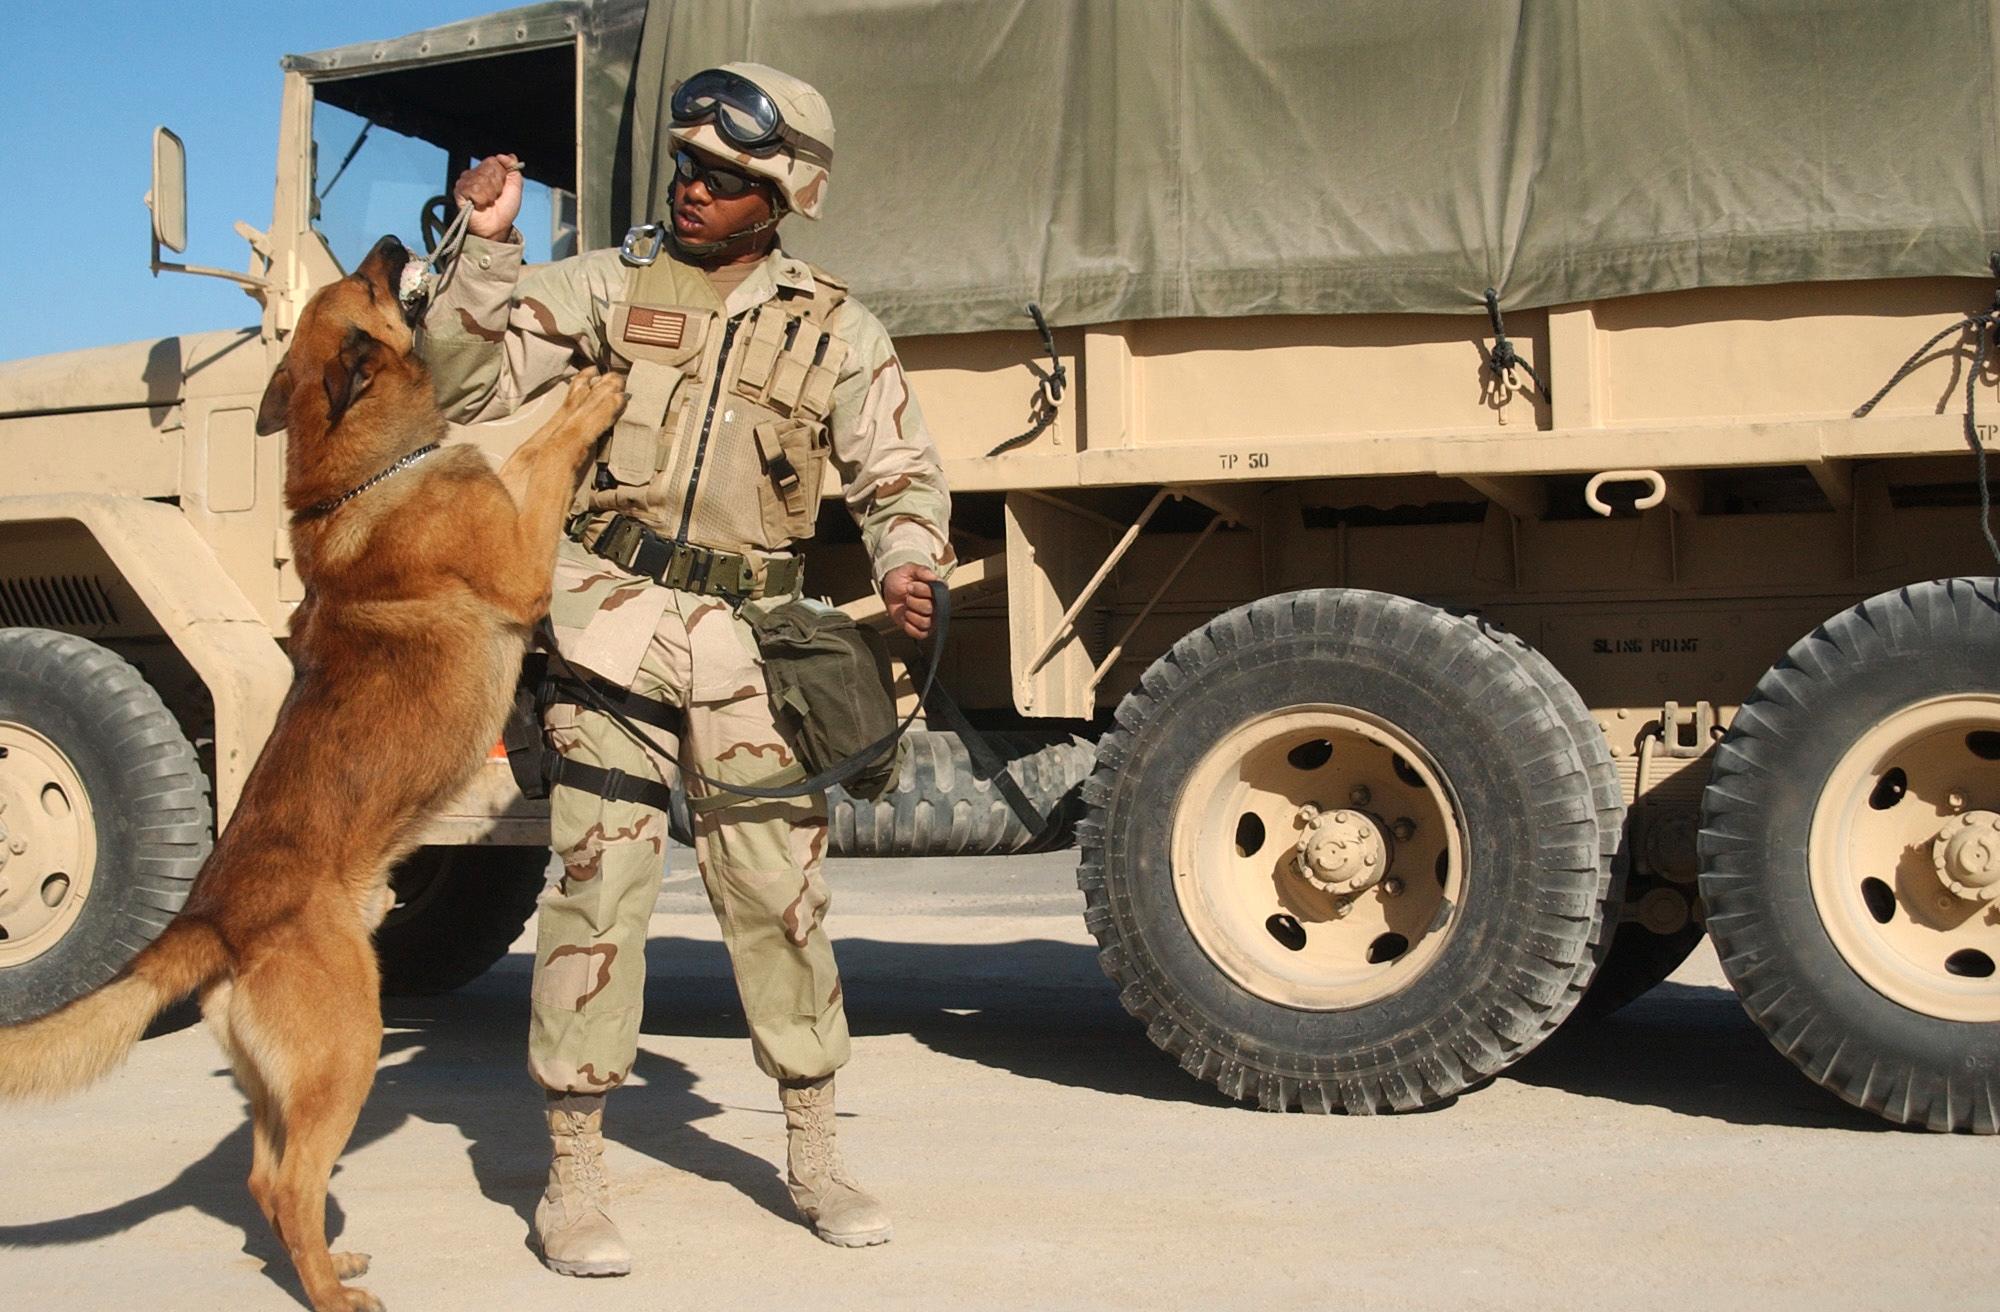 Navy 030302 n 5362a 003 military working dog c patriot kuwait